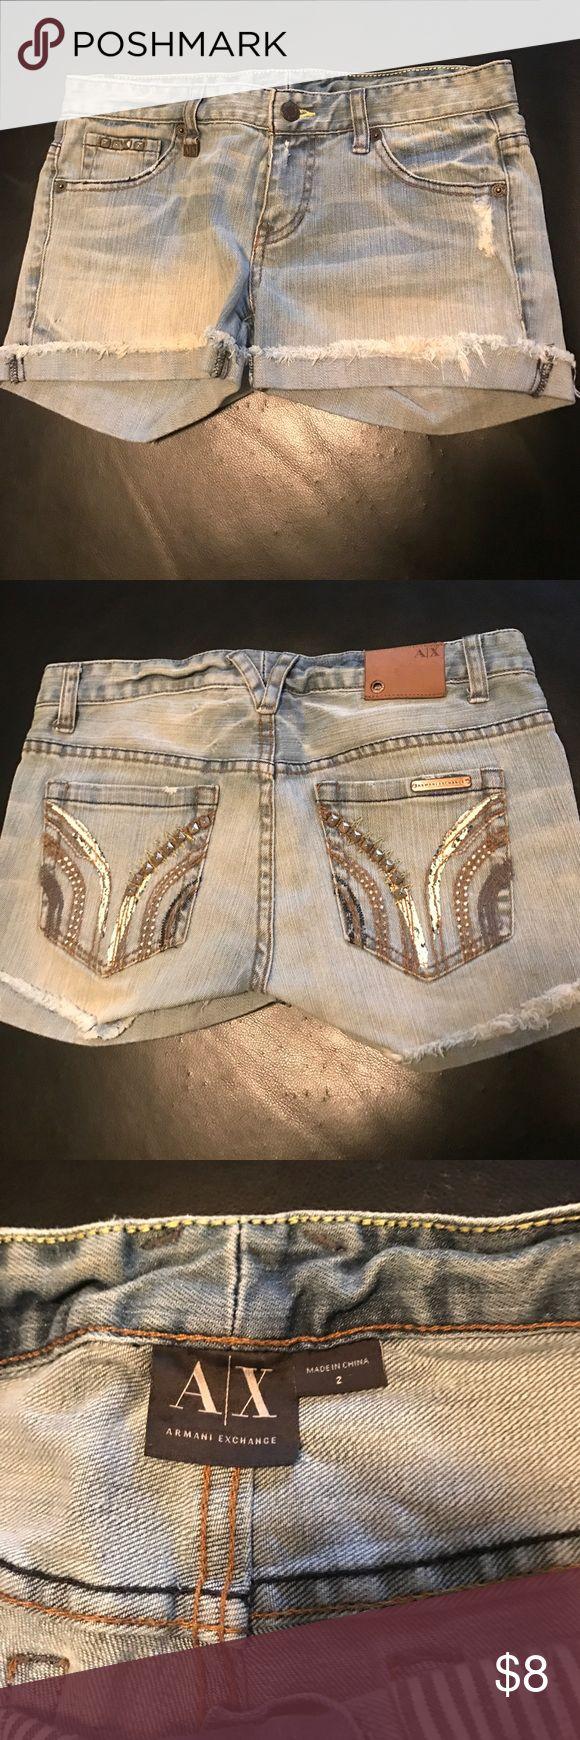 Armani Exchange Shorts Pre Loved! Super cute!! Women's Size 2 A/X Armani Exchange Shorts Jean Shorts